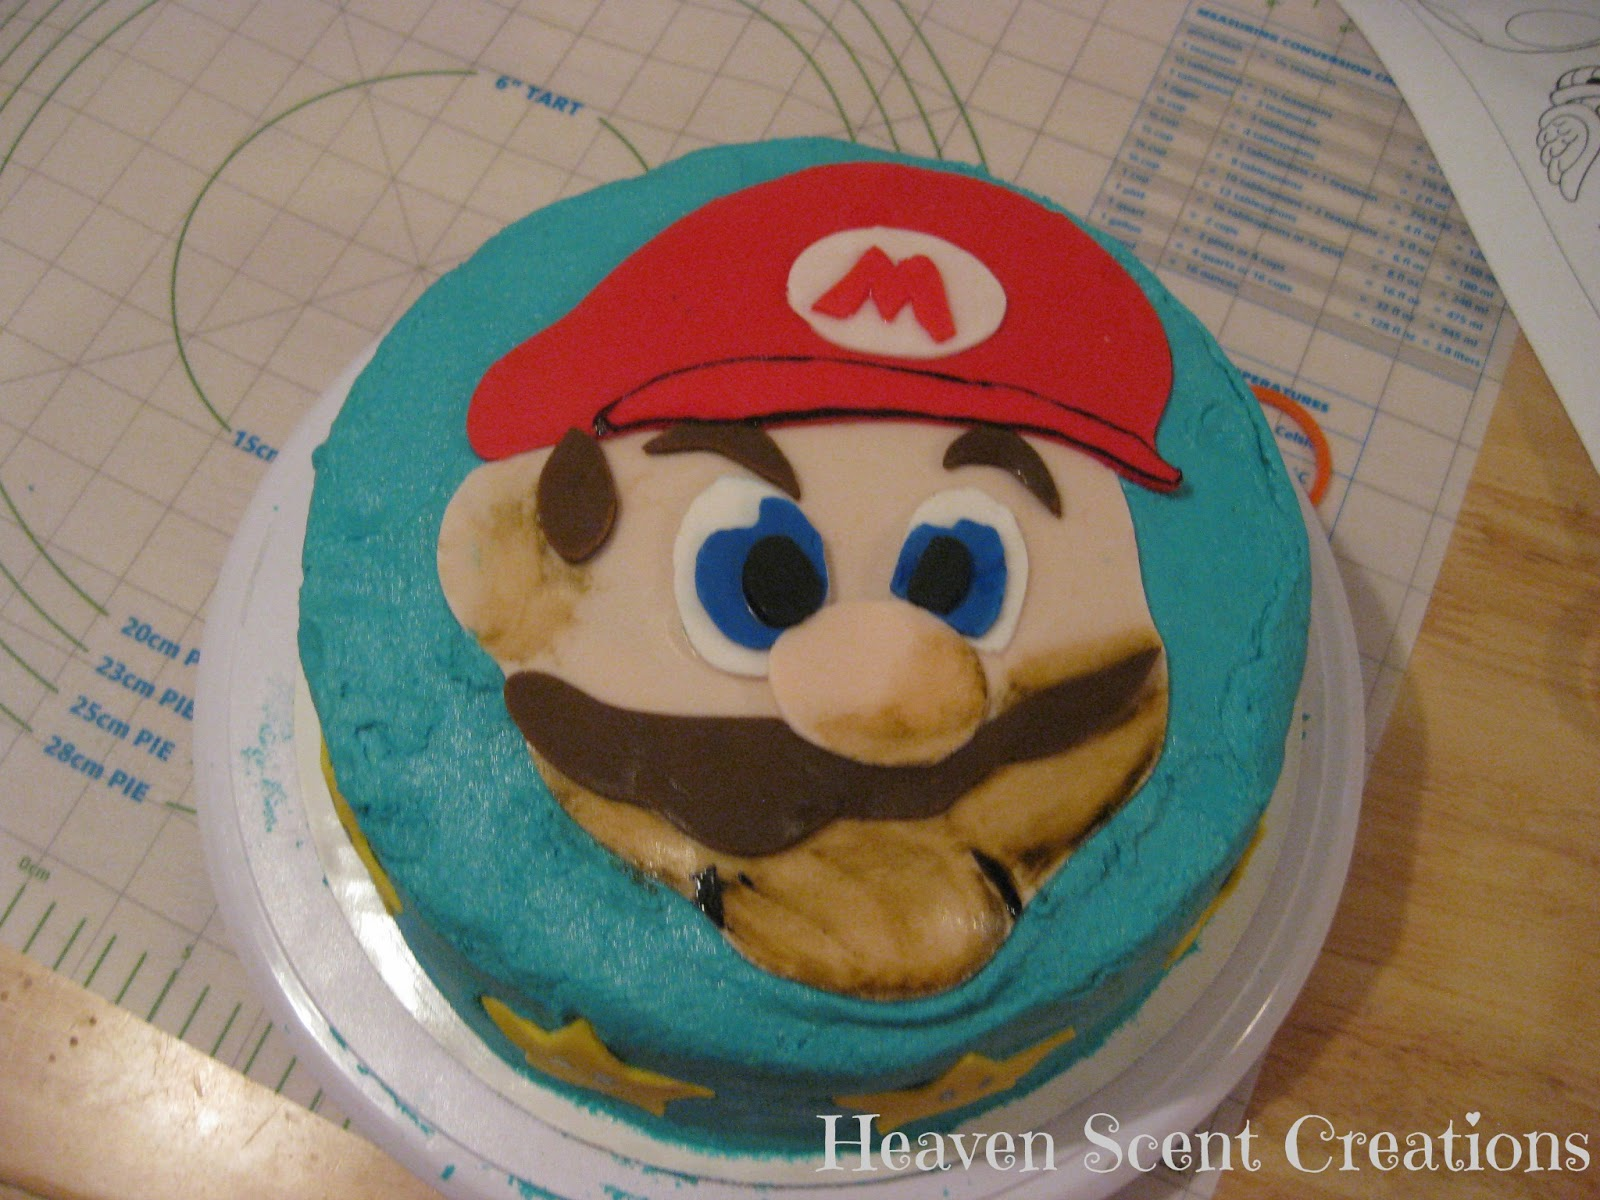 Heaven Scent Creations: Super Mario Bros. Cake